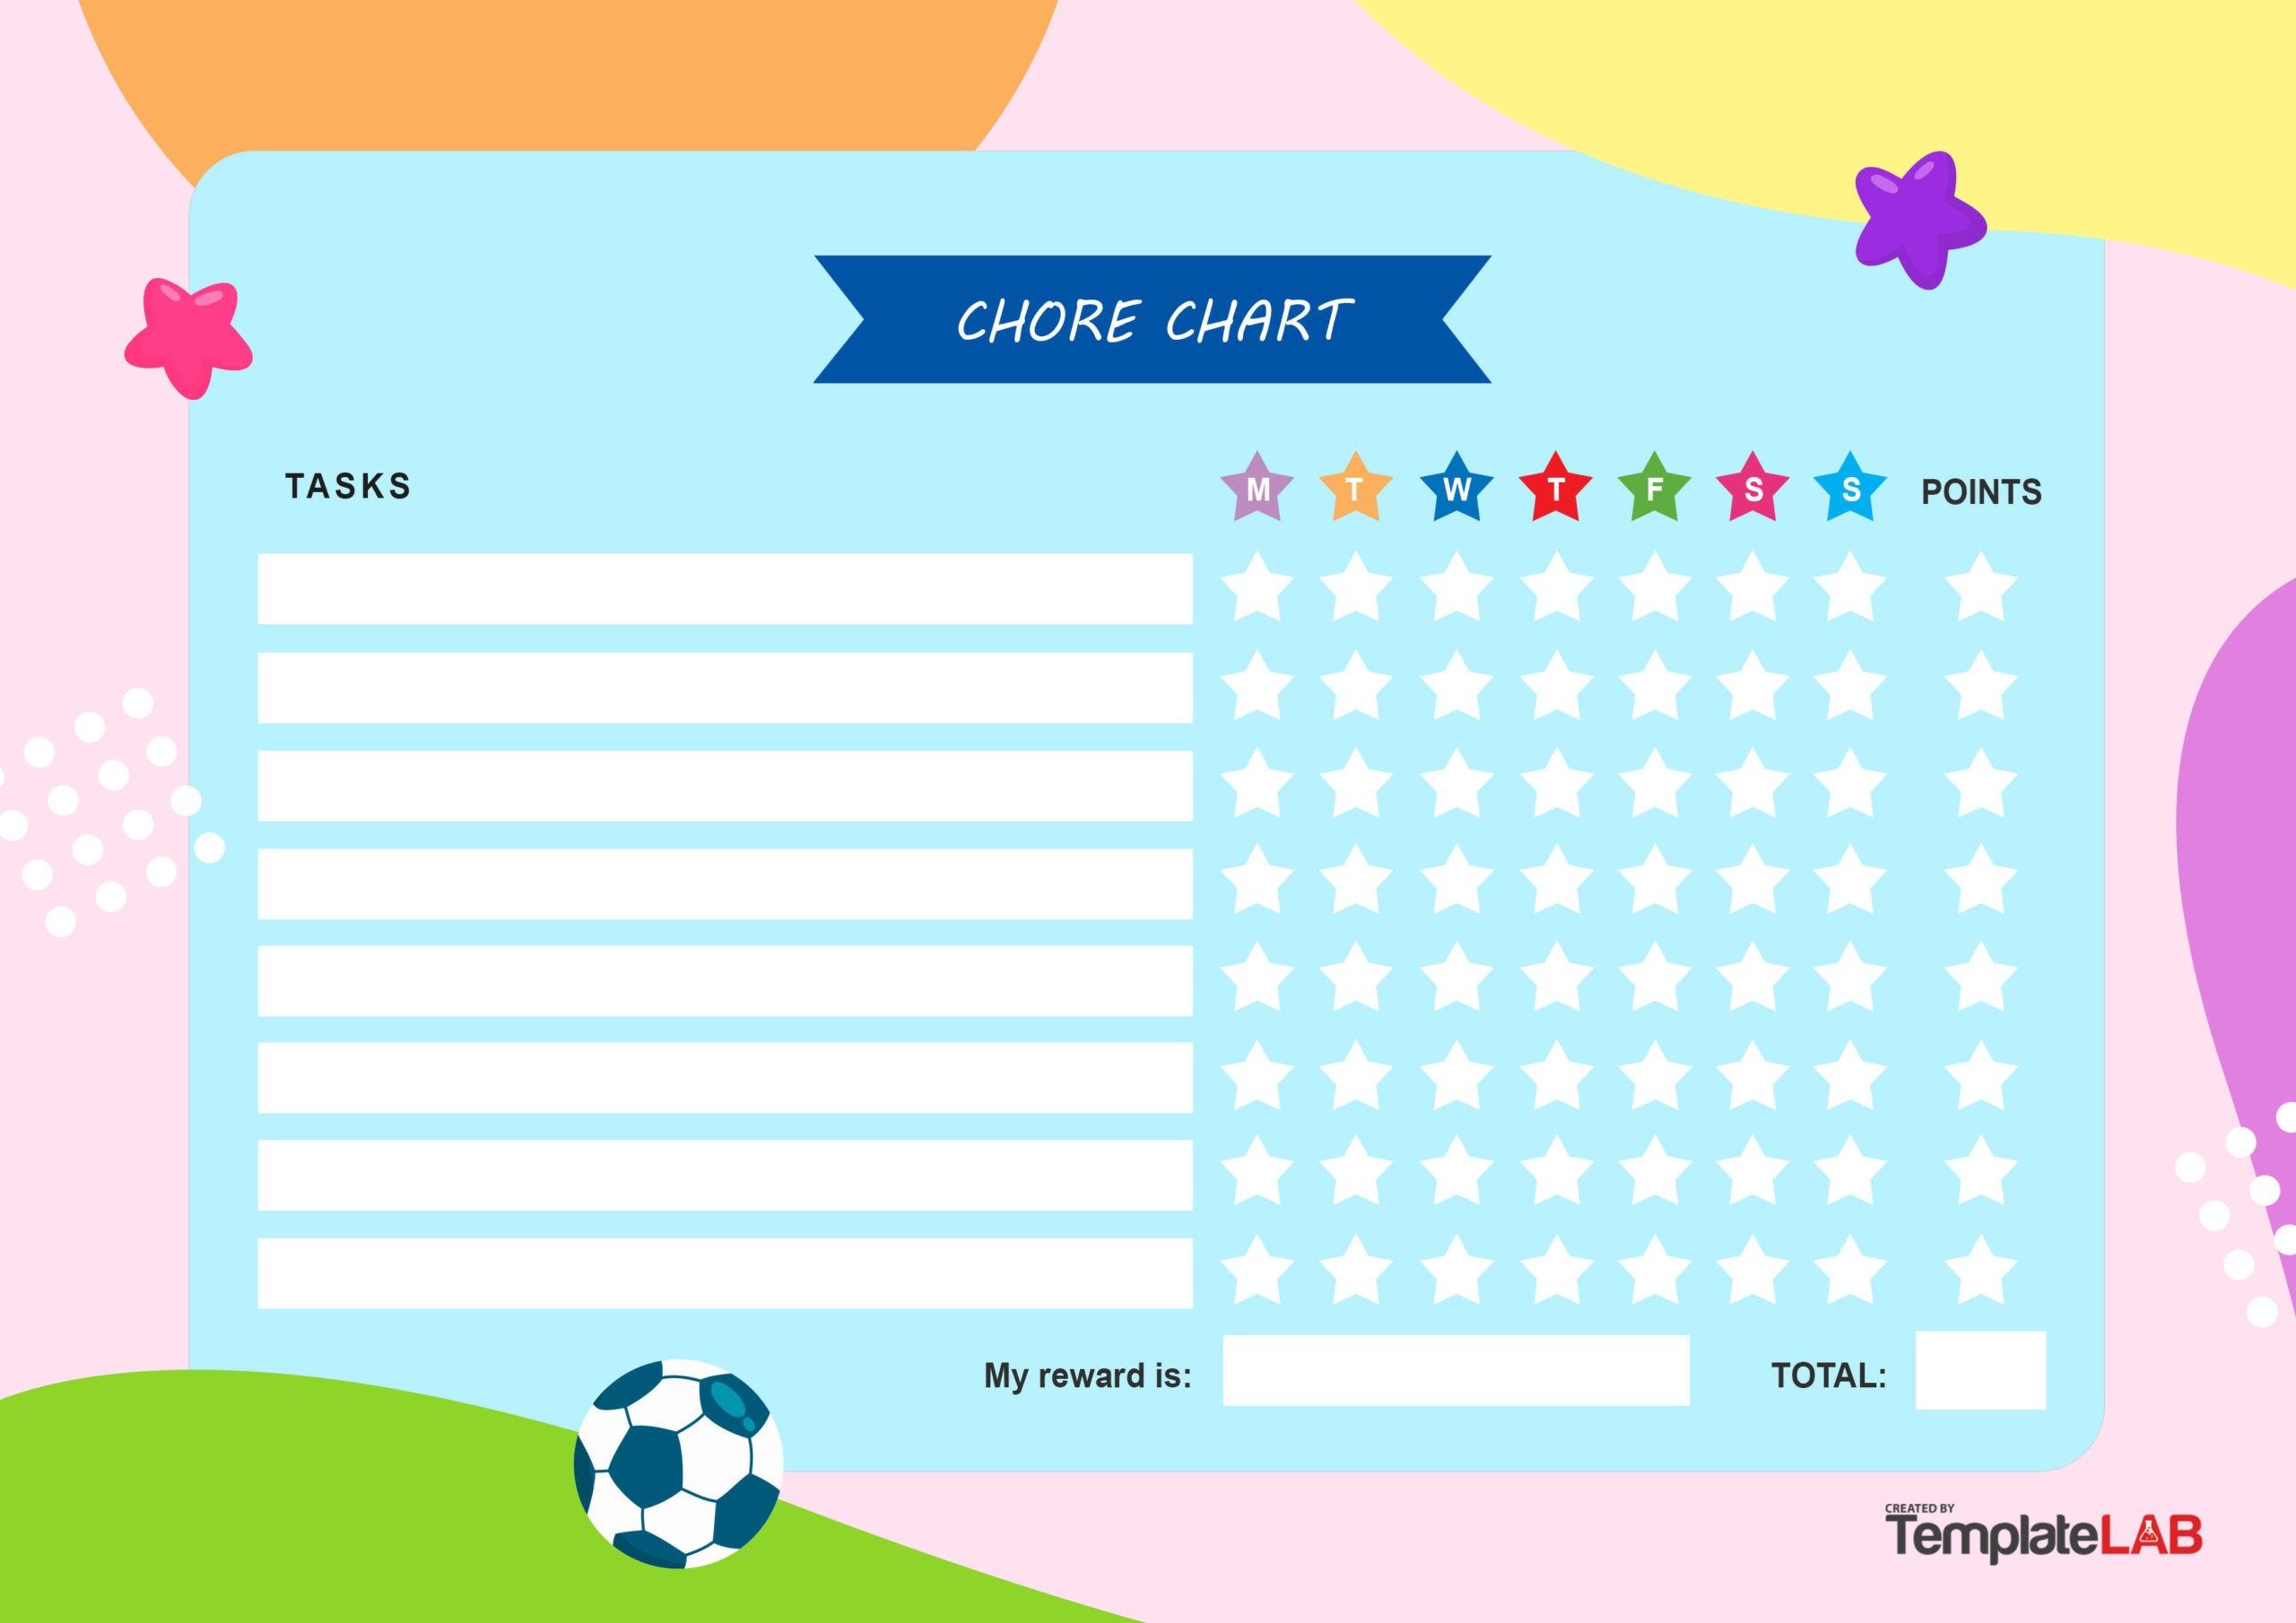 Free Kids Chore Chart v2 - TemplateLab.com